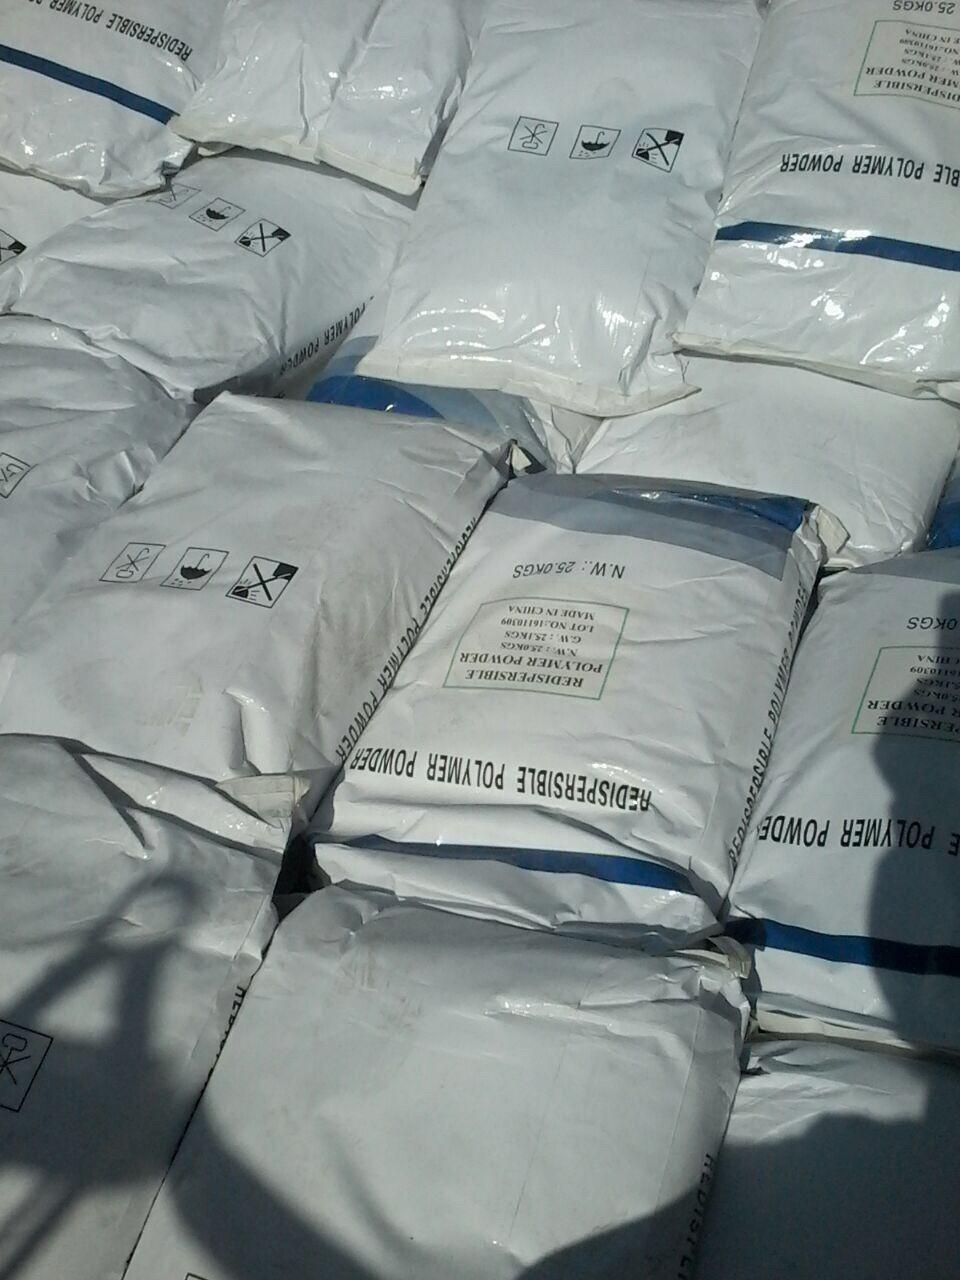 Redispersible polymer powder, HPMC,HEMC, PP FIBER